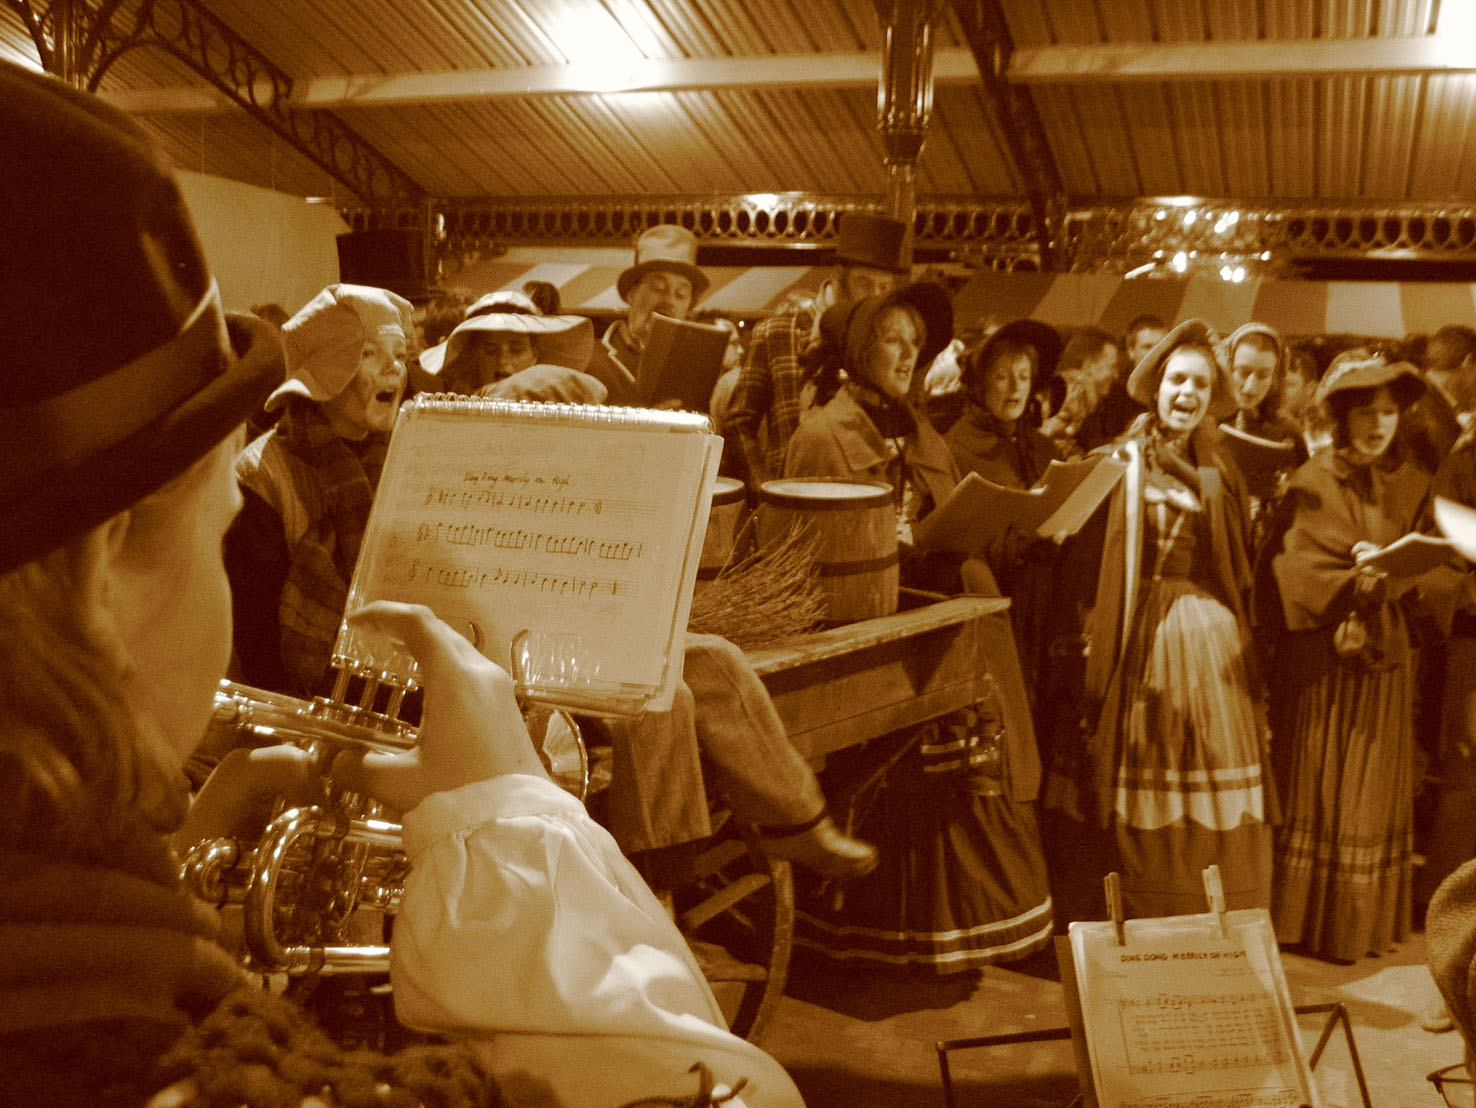 122 - Kerstmarkt Helmond 2003.jpg